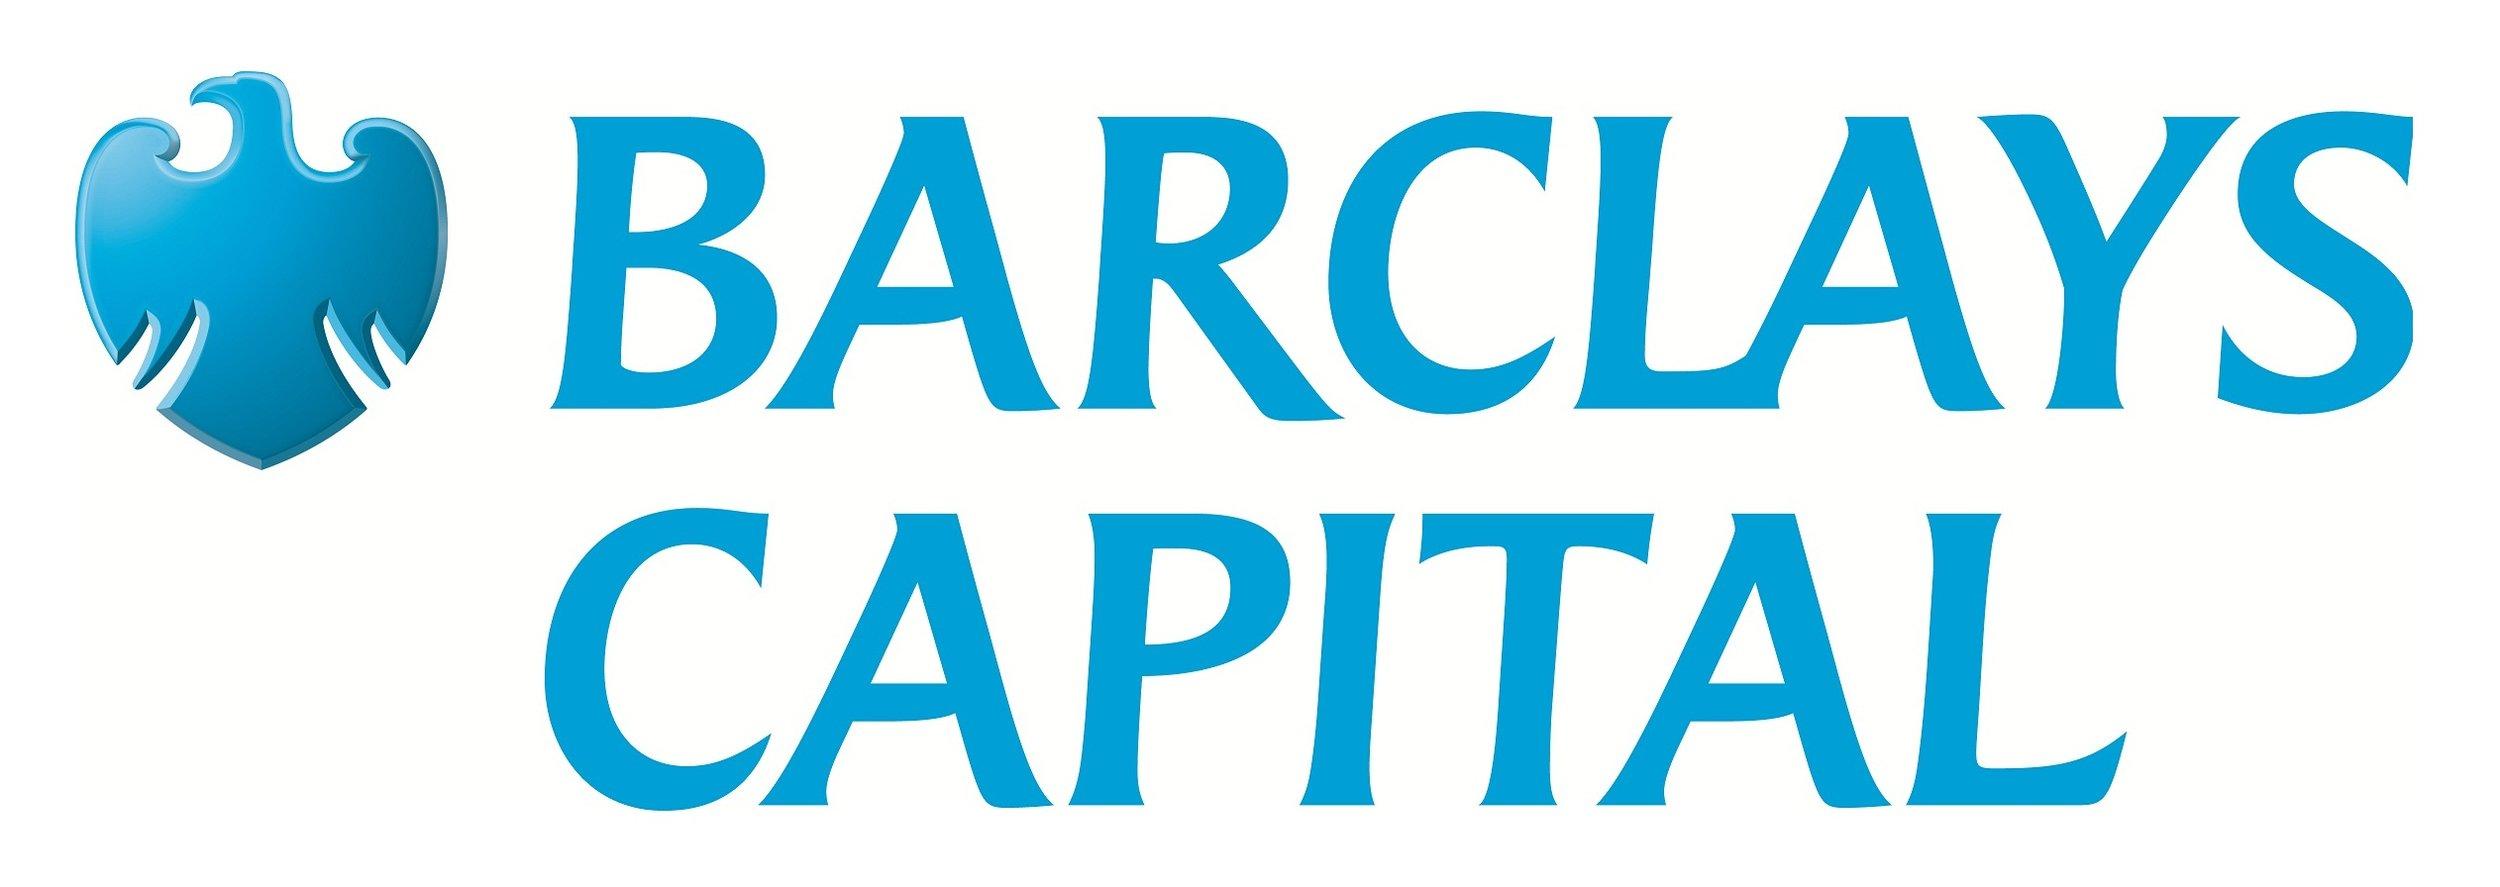 barclays-capital-logo.jpeg